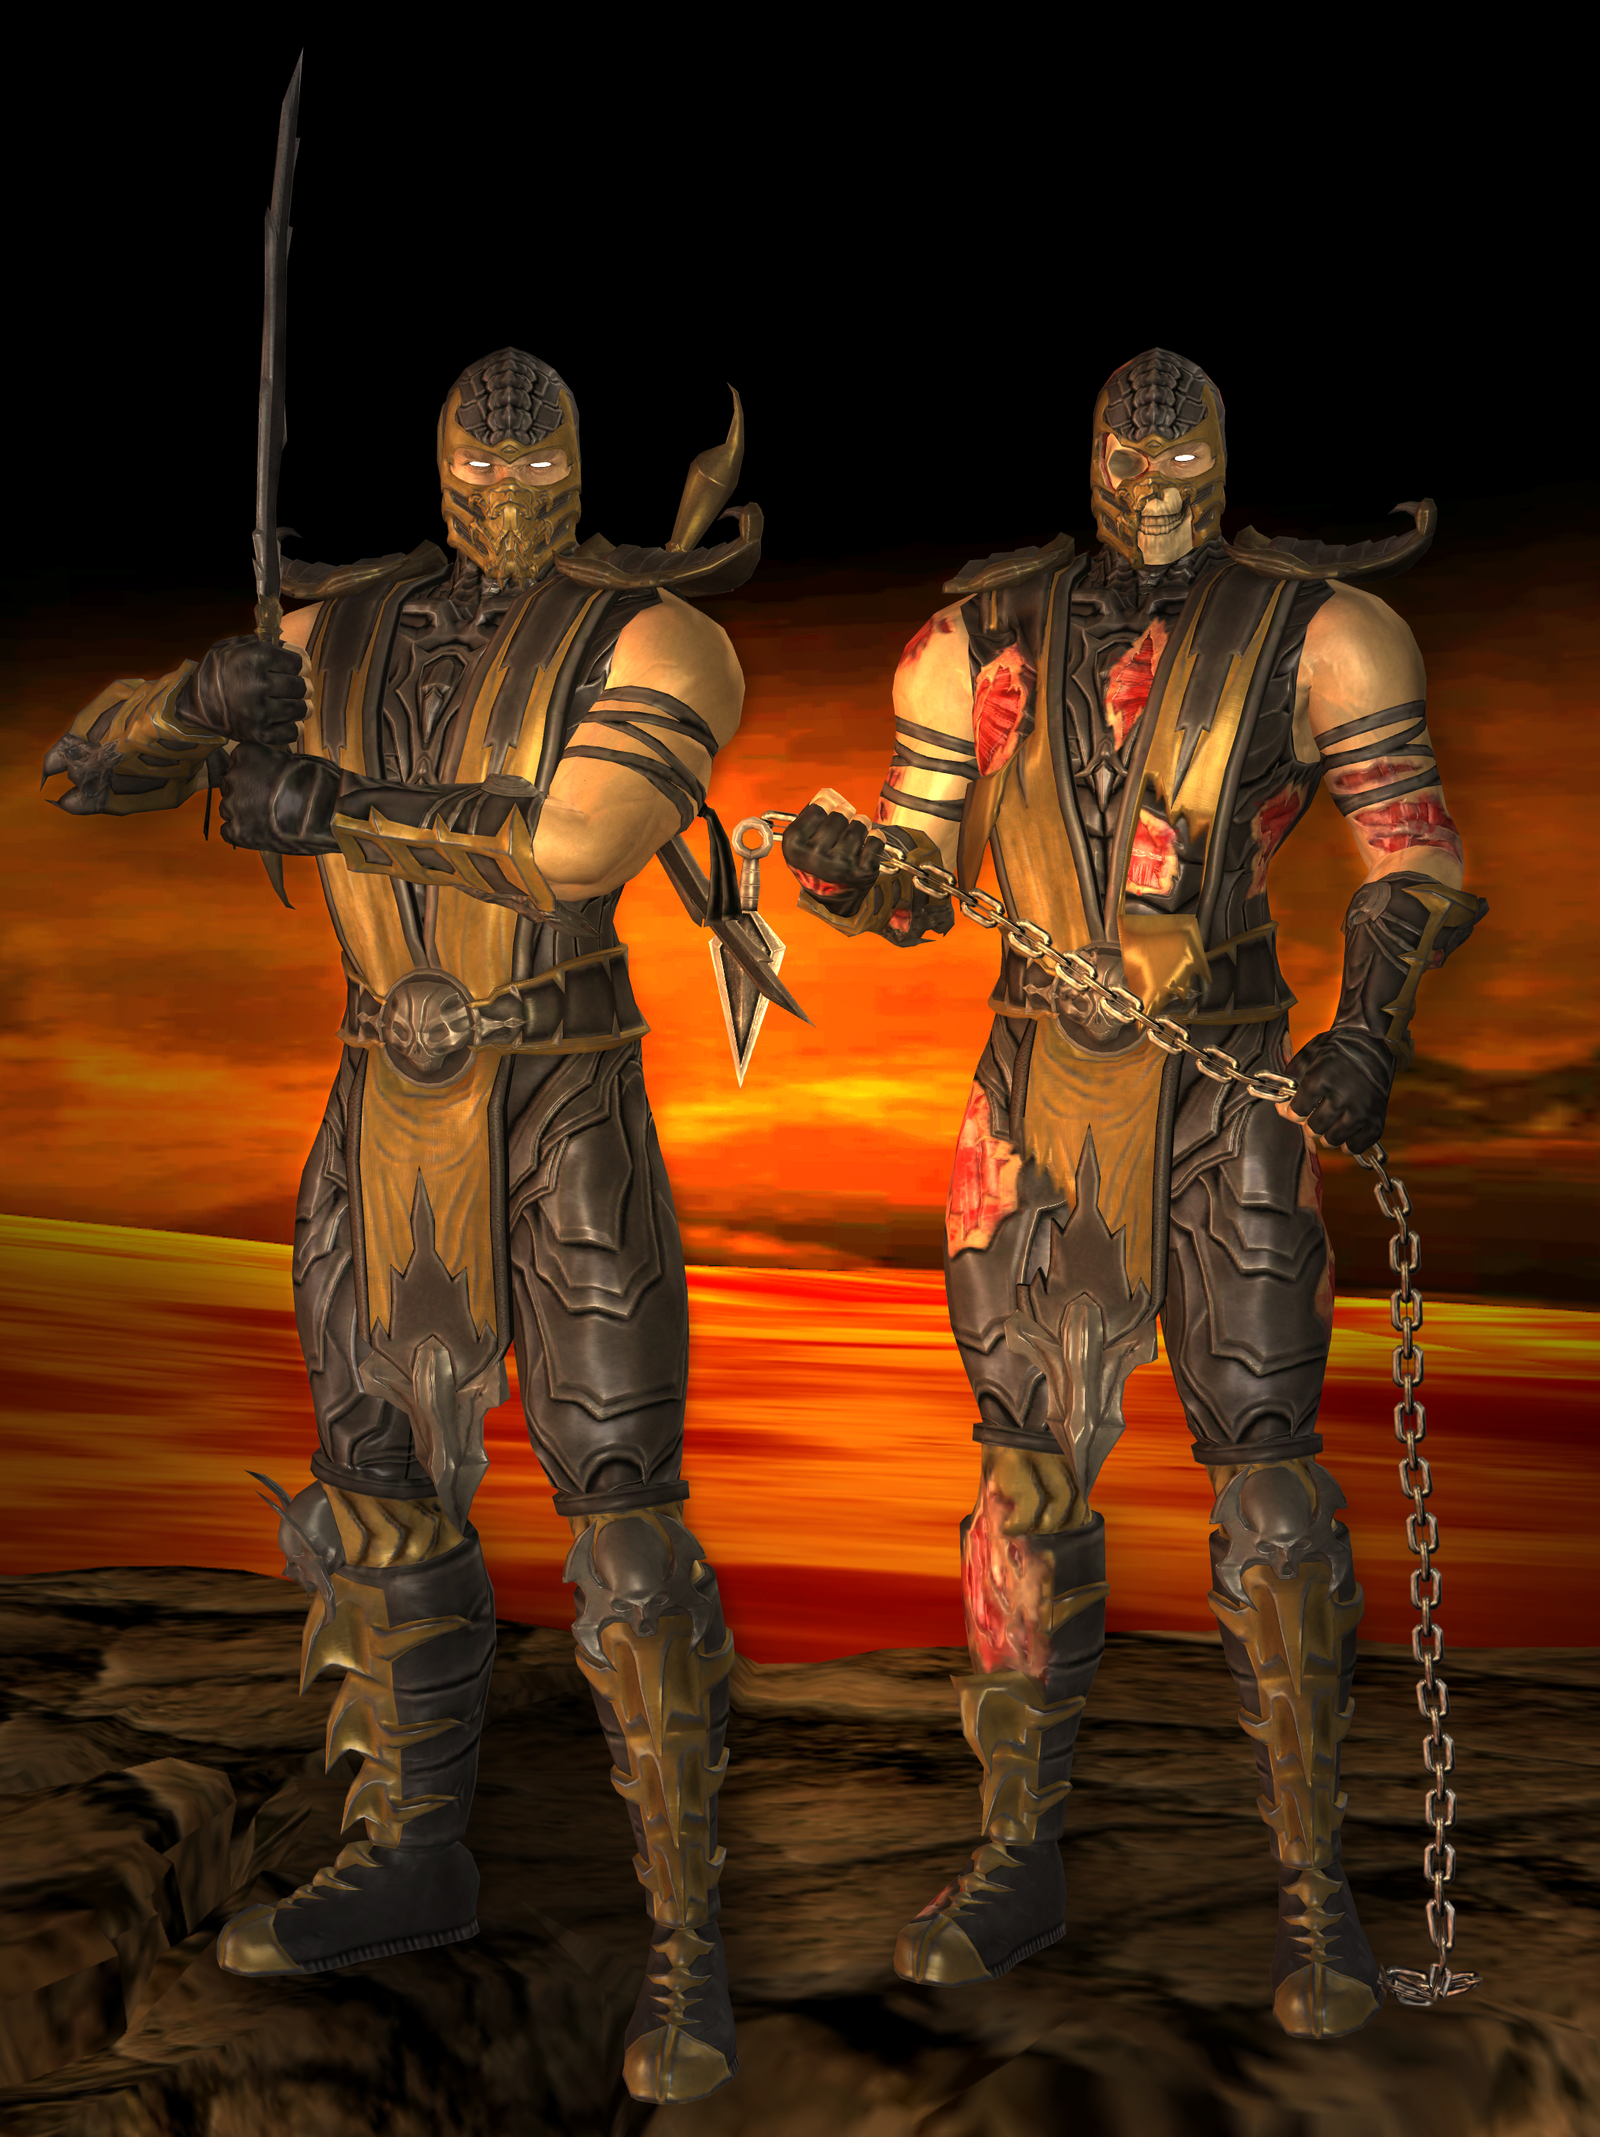 Scorpion Primary - Mortal Kombat 9 by romero1718 on DeviantArt